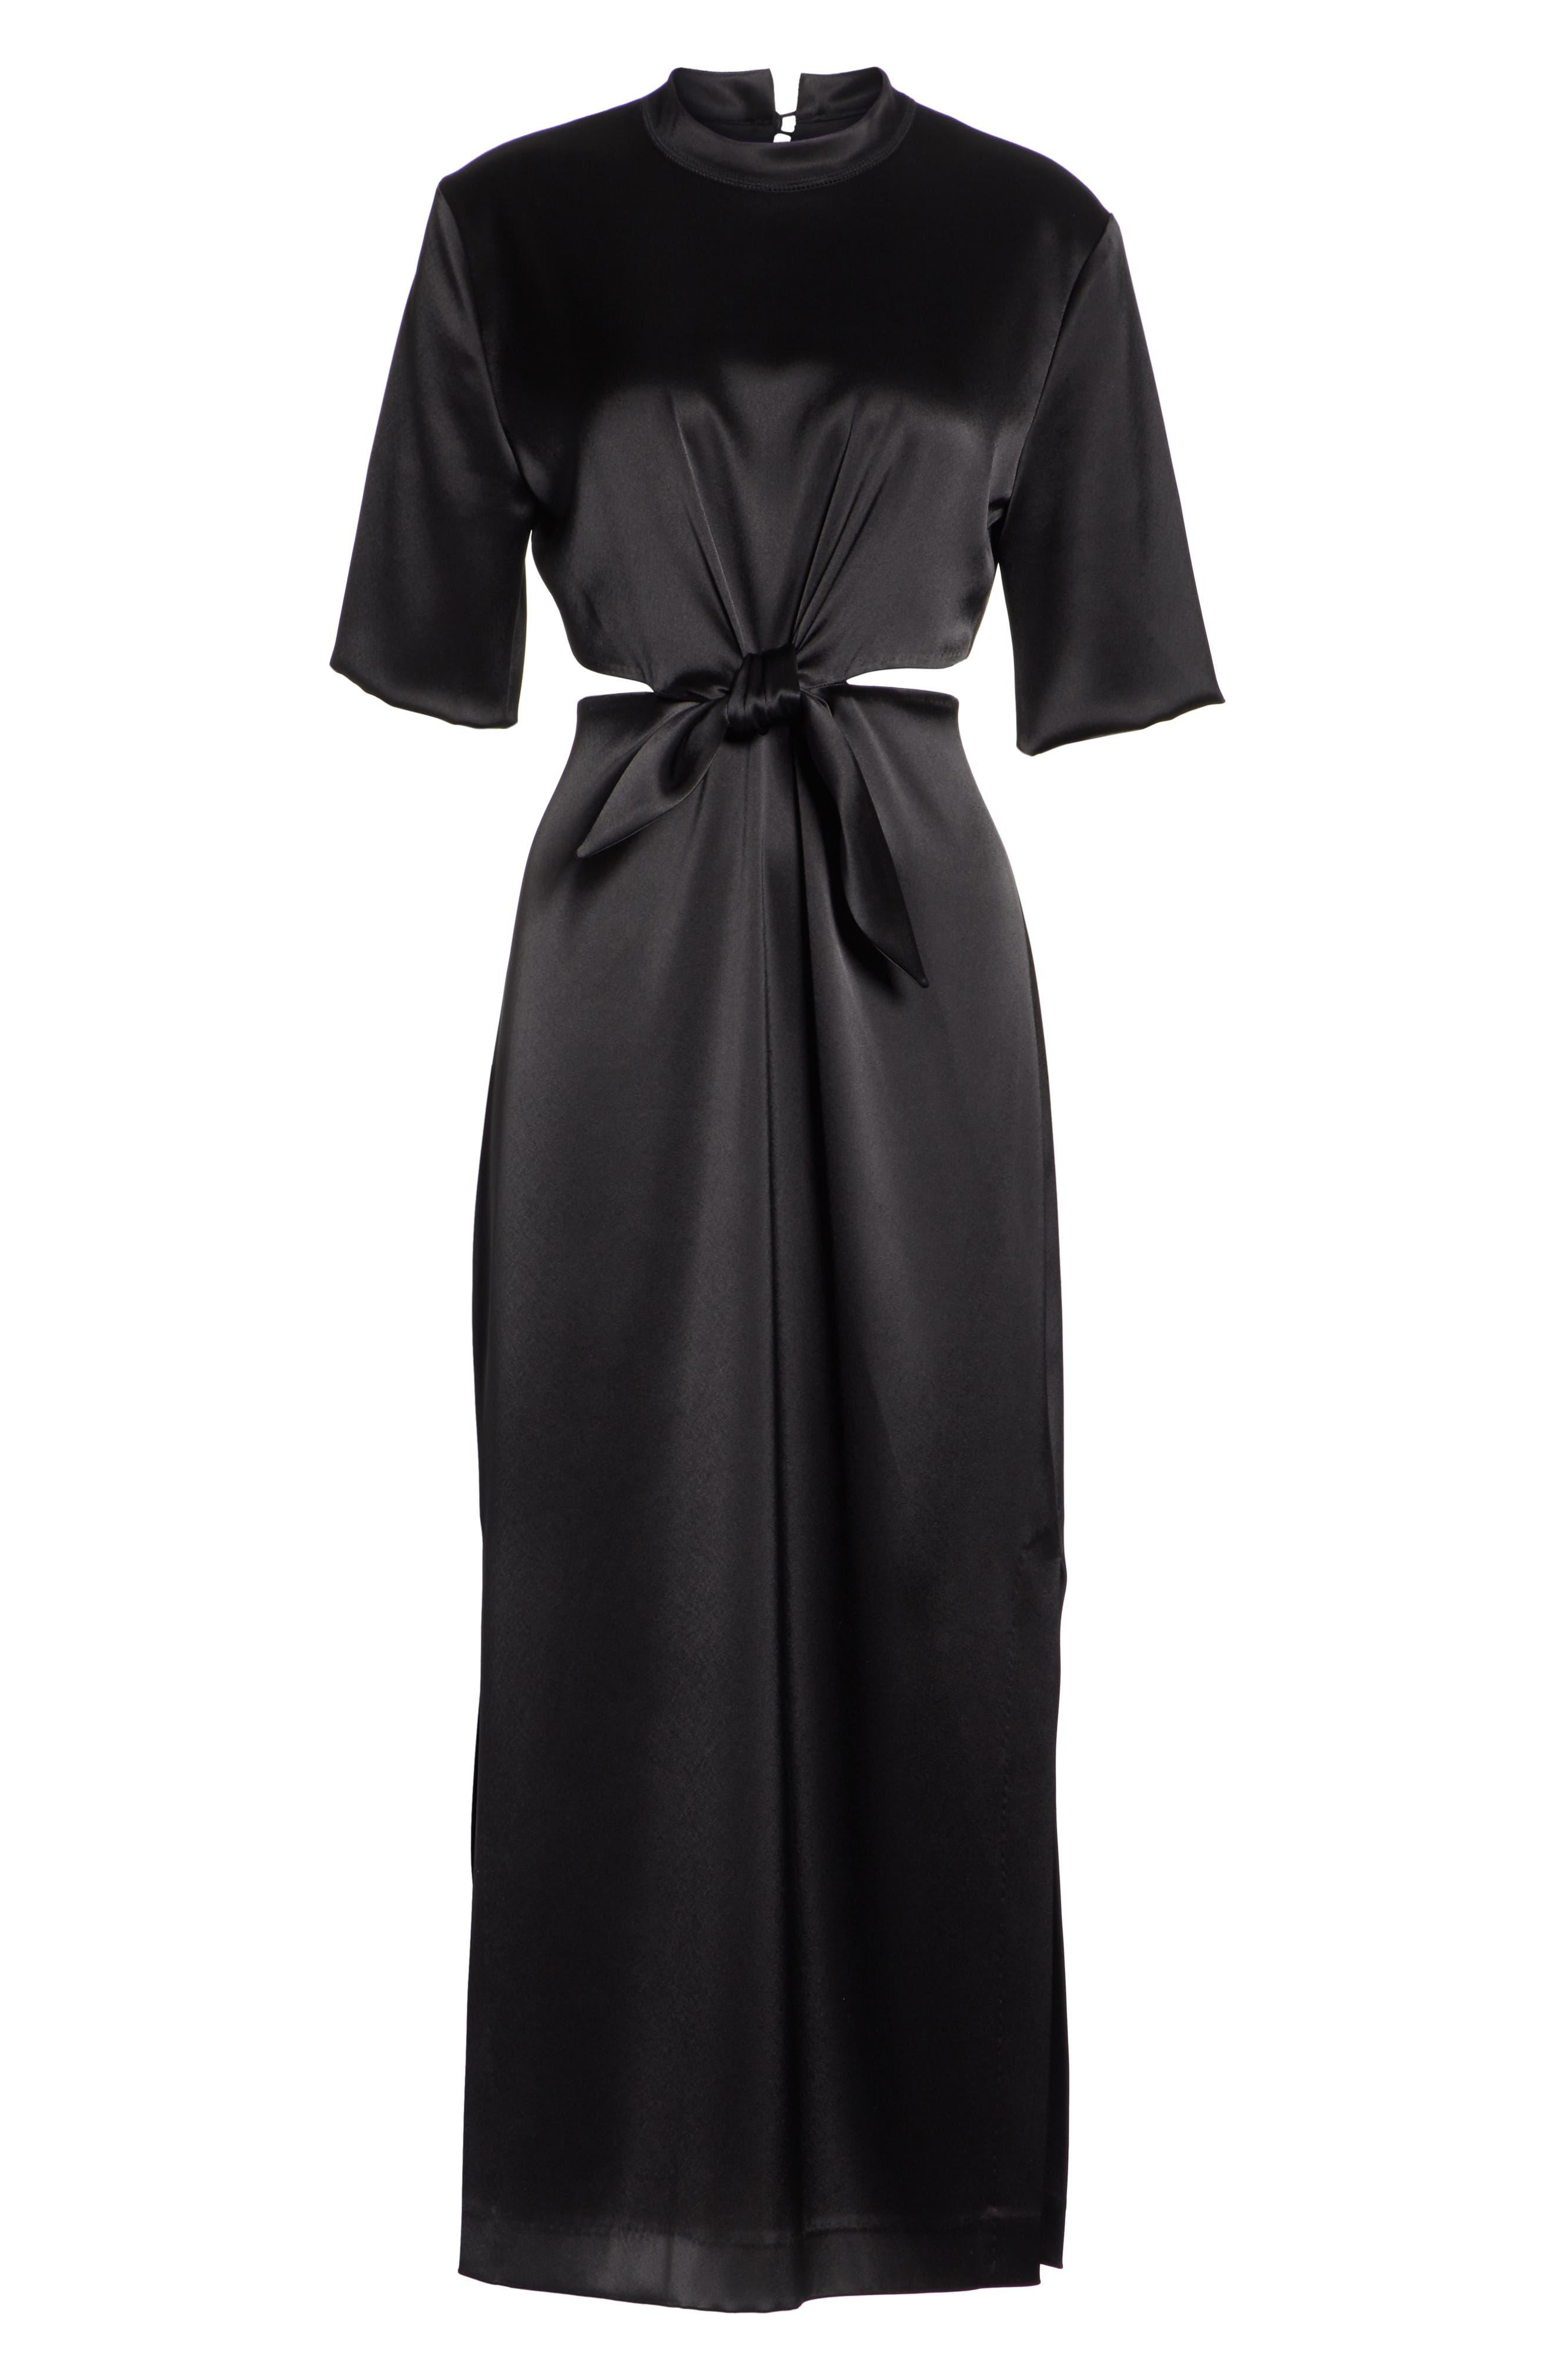 Bhumi Tie Waist Satin Dress,                             Alternate thumbnail 6, color,                             Black